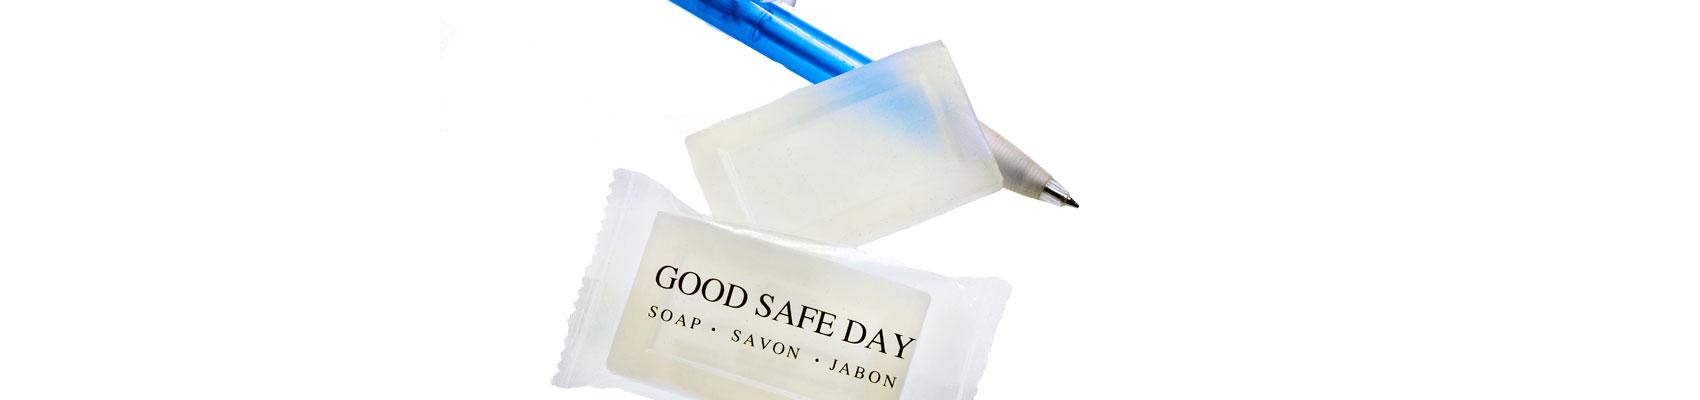 Transmacro Amenities Translucent Bar Soap